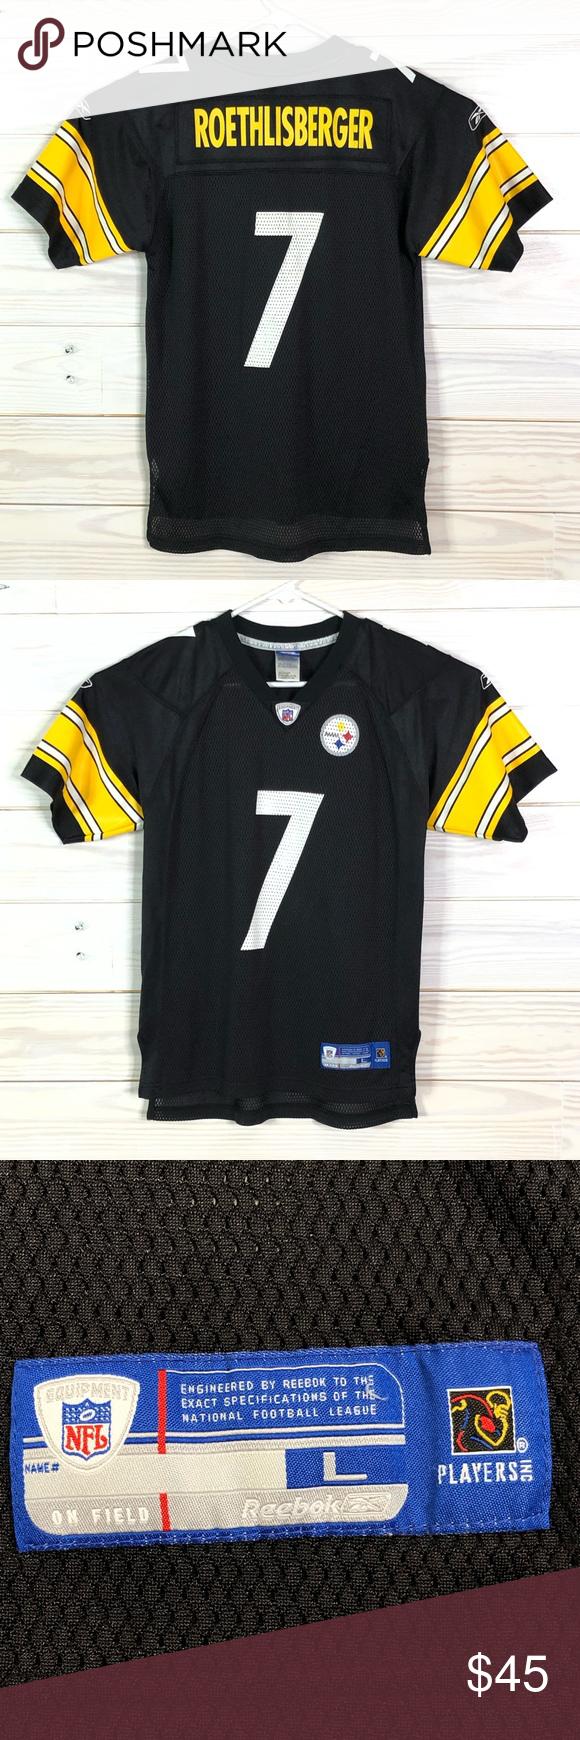 Ben Roethlisberger Of The Pittsburgh Steelers In Action Against The Pittsburgh Steelers Steelers Pittsburgh